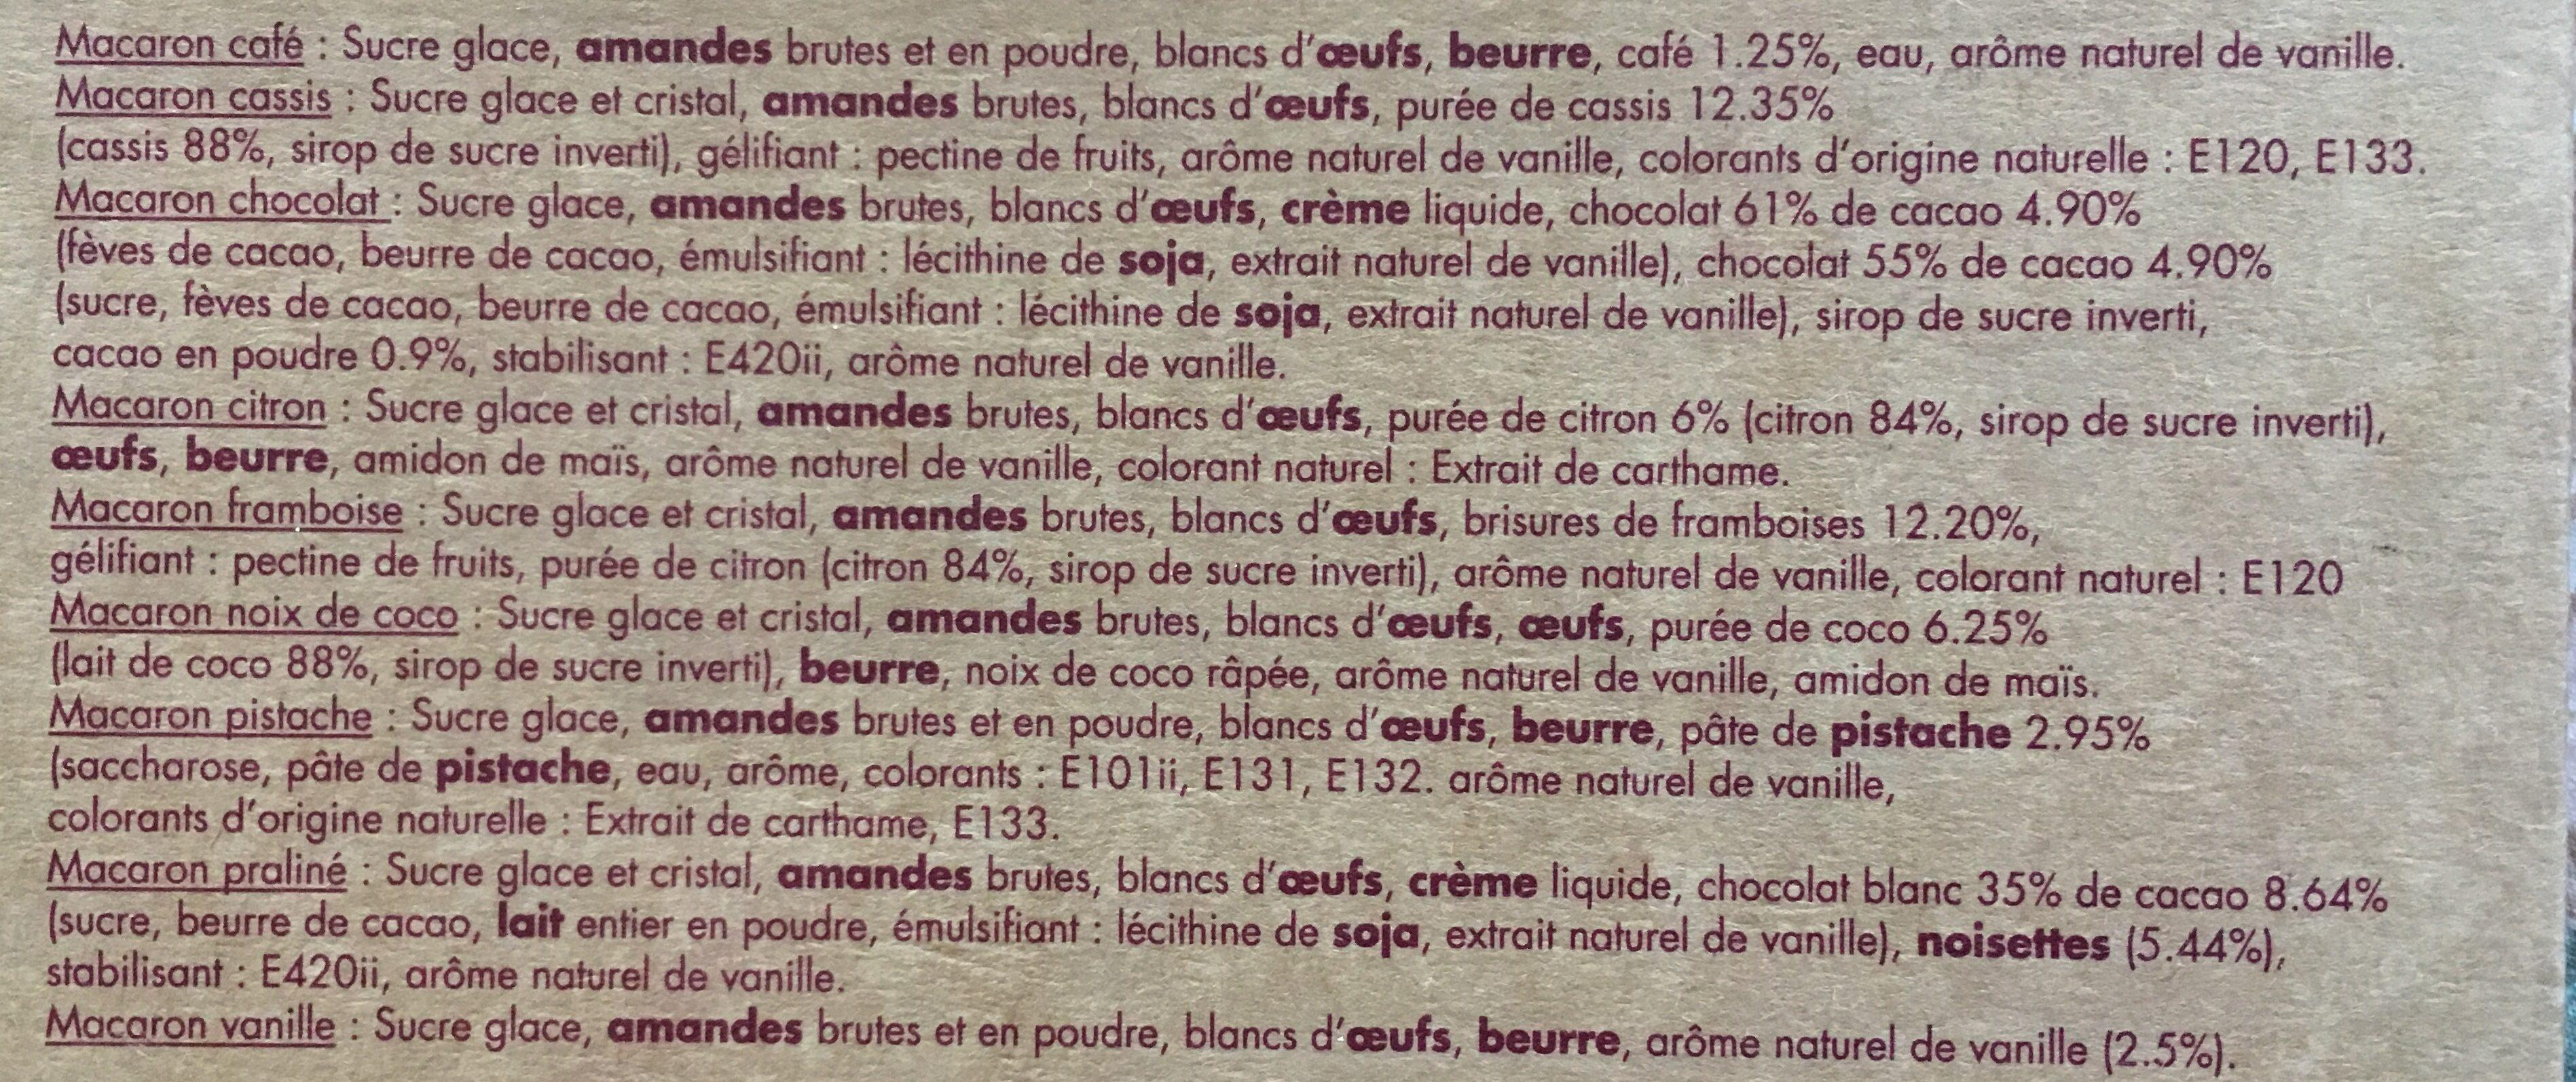 9 Macarons Frais Assortis - Ingrédients - fr